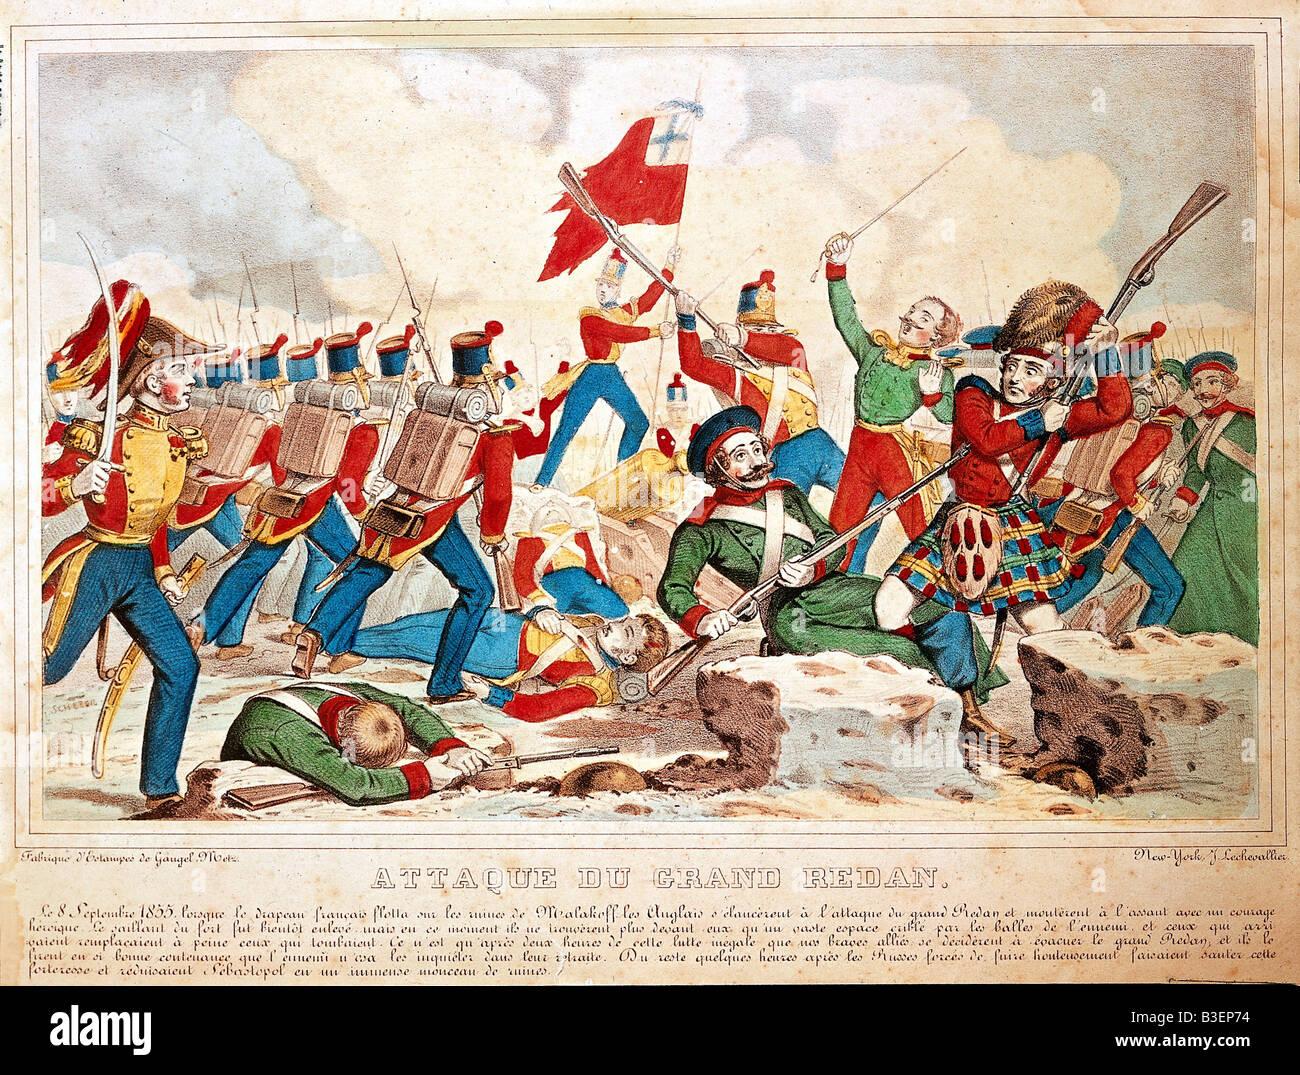 Crimean War 1853 - 1856, siege of Sevastopol 2.9.1854 - 9.9.1855, battle for the Redan 8.9.1855, coloured lithograph - Stock Image